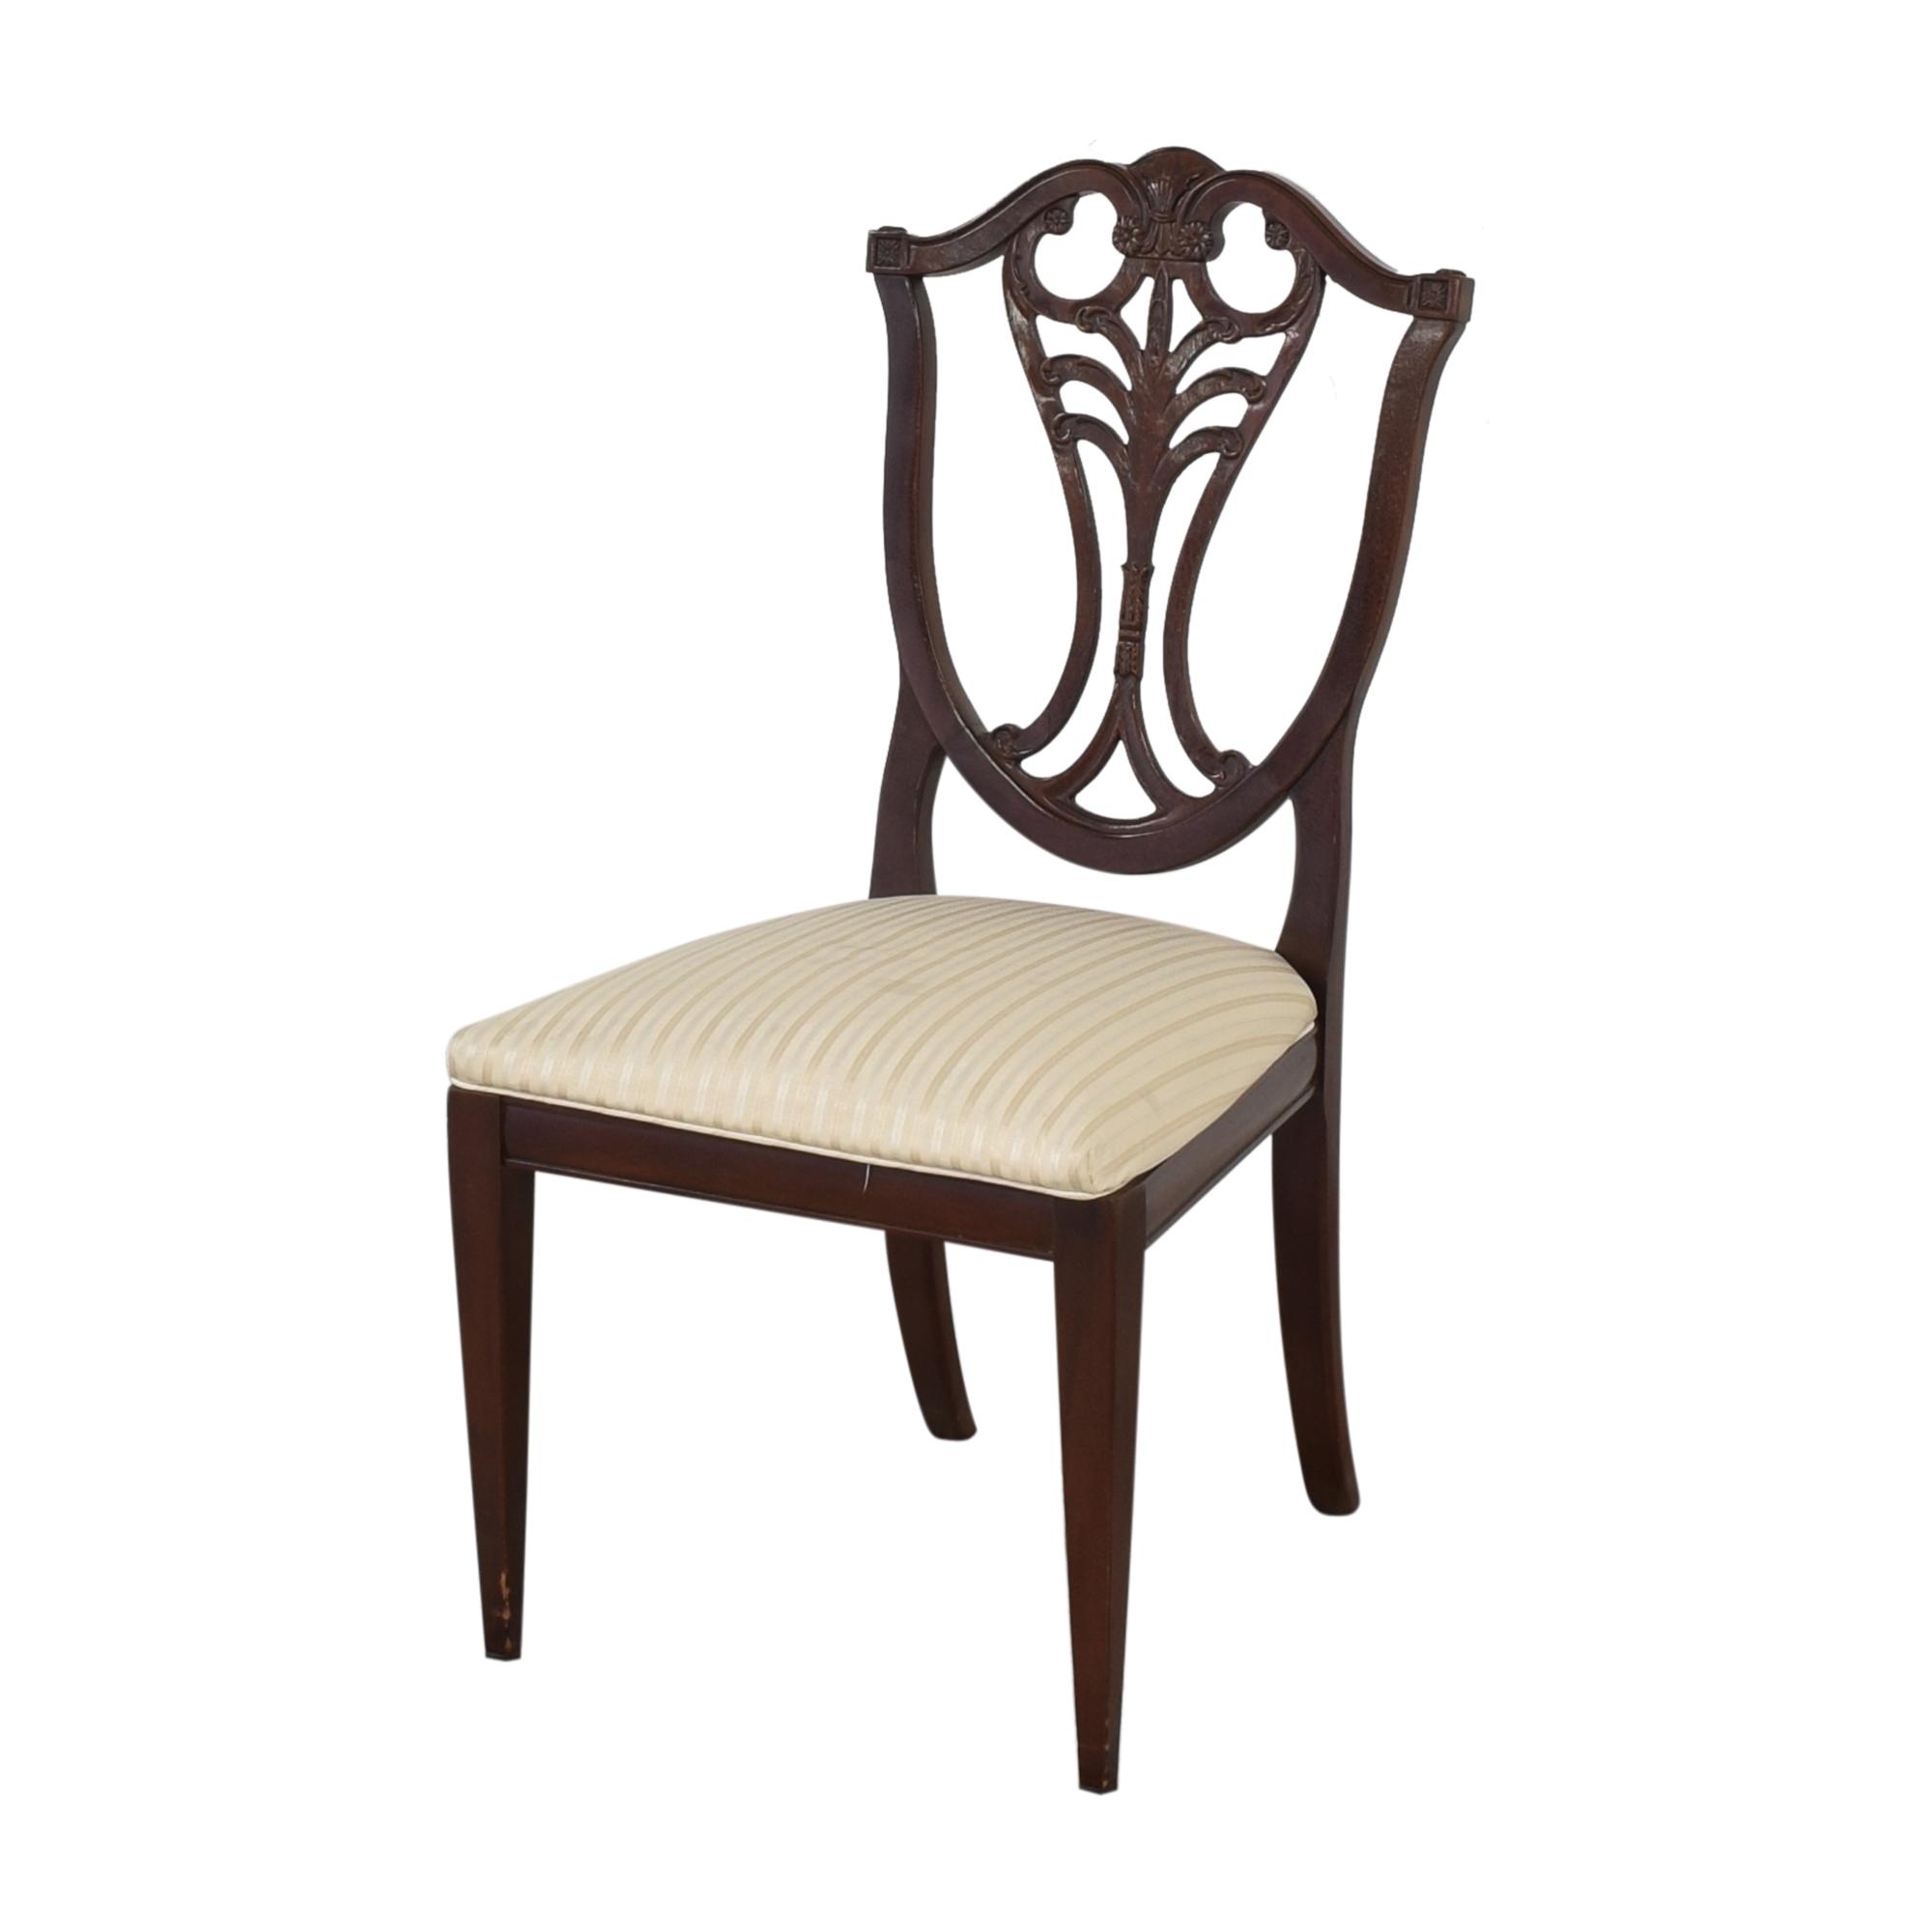 Henredon Furniture Henredon Furniture Dining Chairs ct